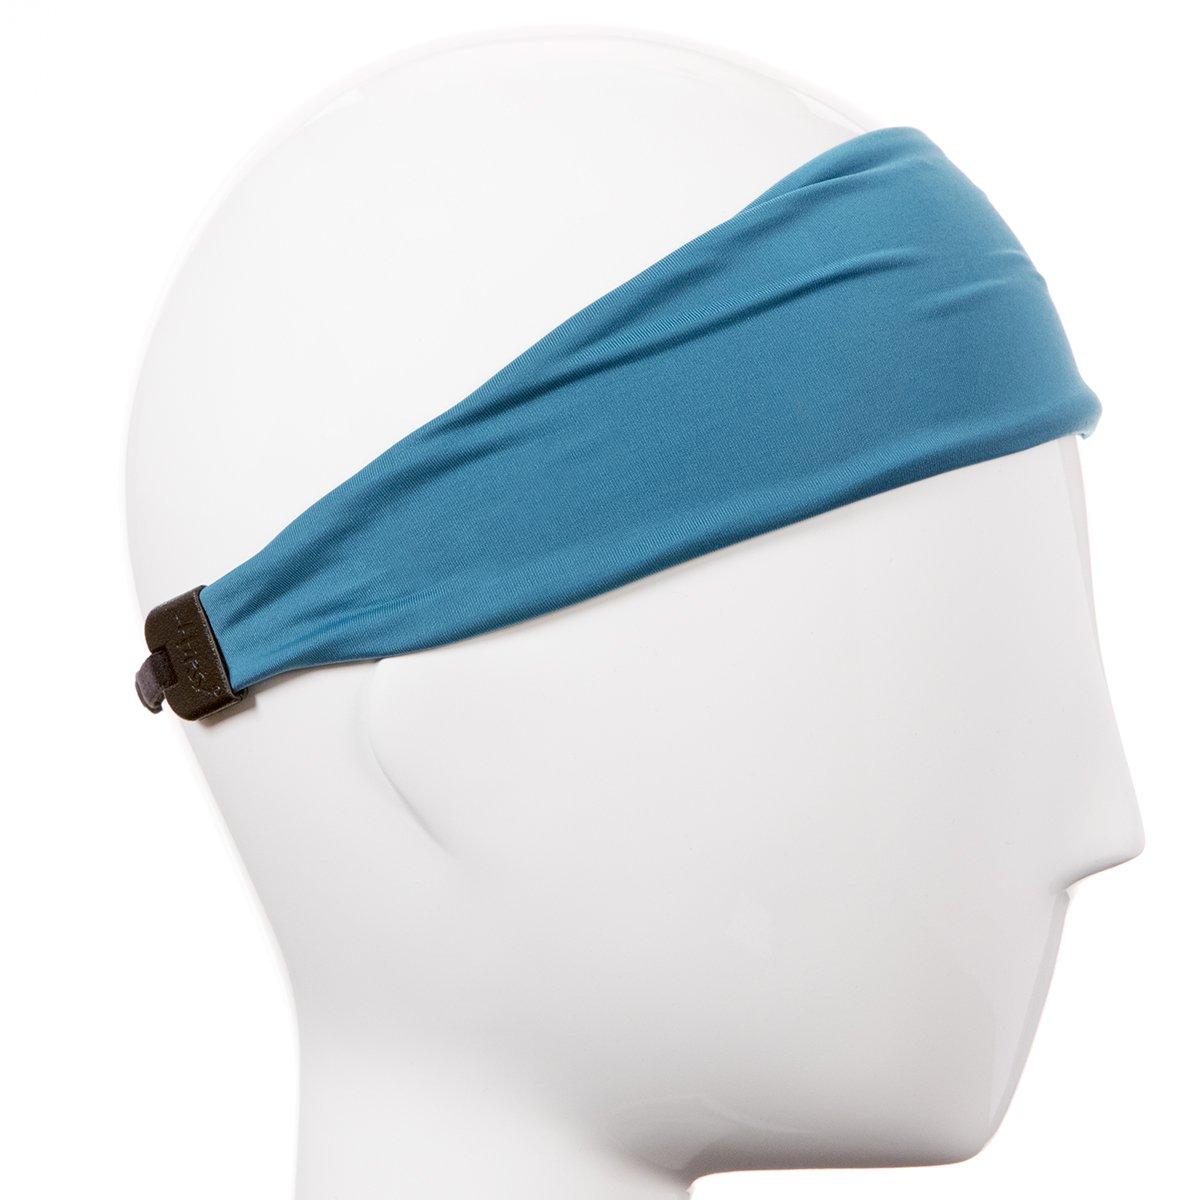 Hipsy Xflex Basic Adjustable /& Stretchy Wide Sports Headbands for Women